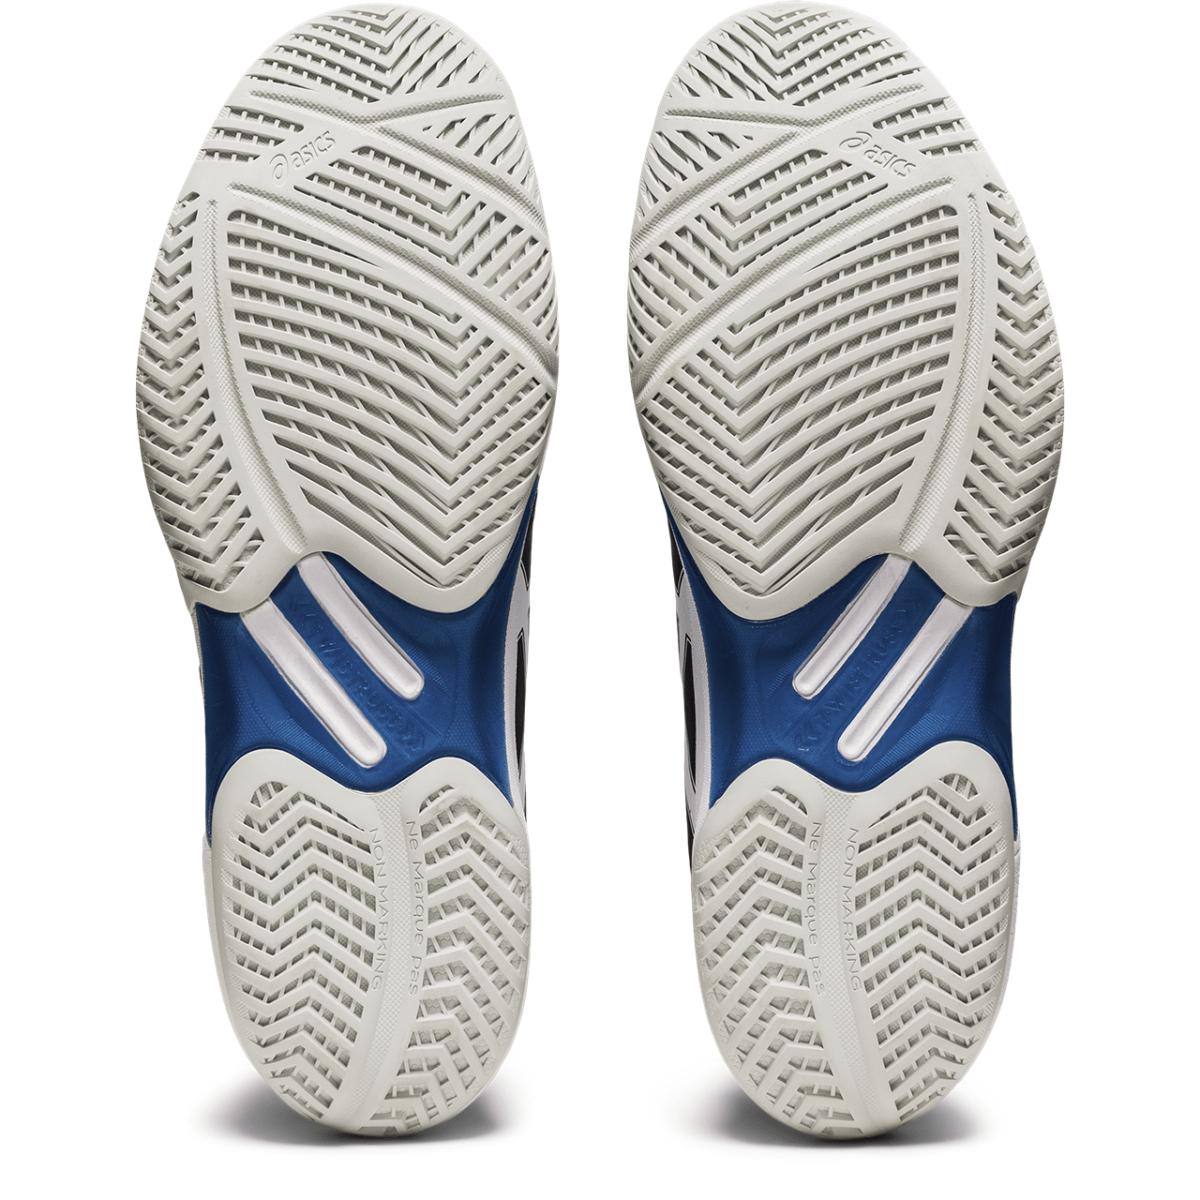 Asics Sky Elite FF M 2021 (Reborn Blue/White) meeste võrkpallijalats